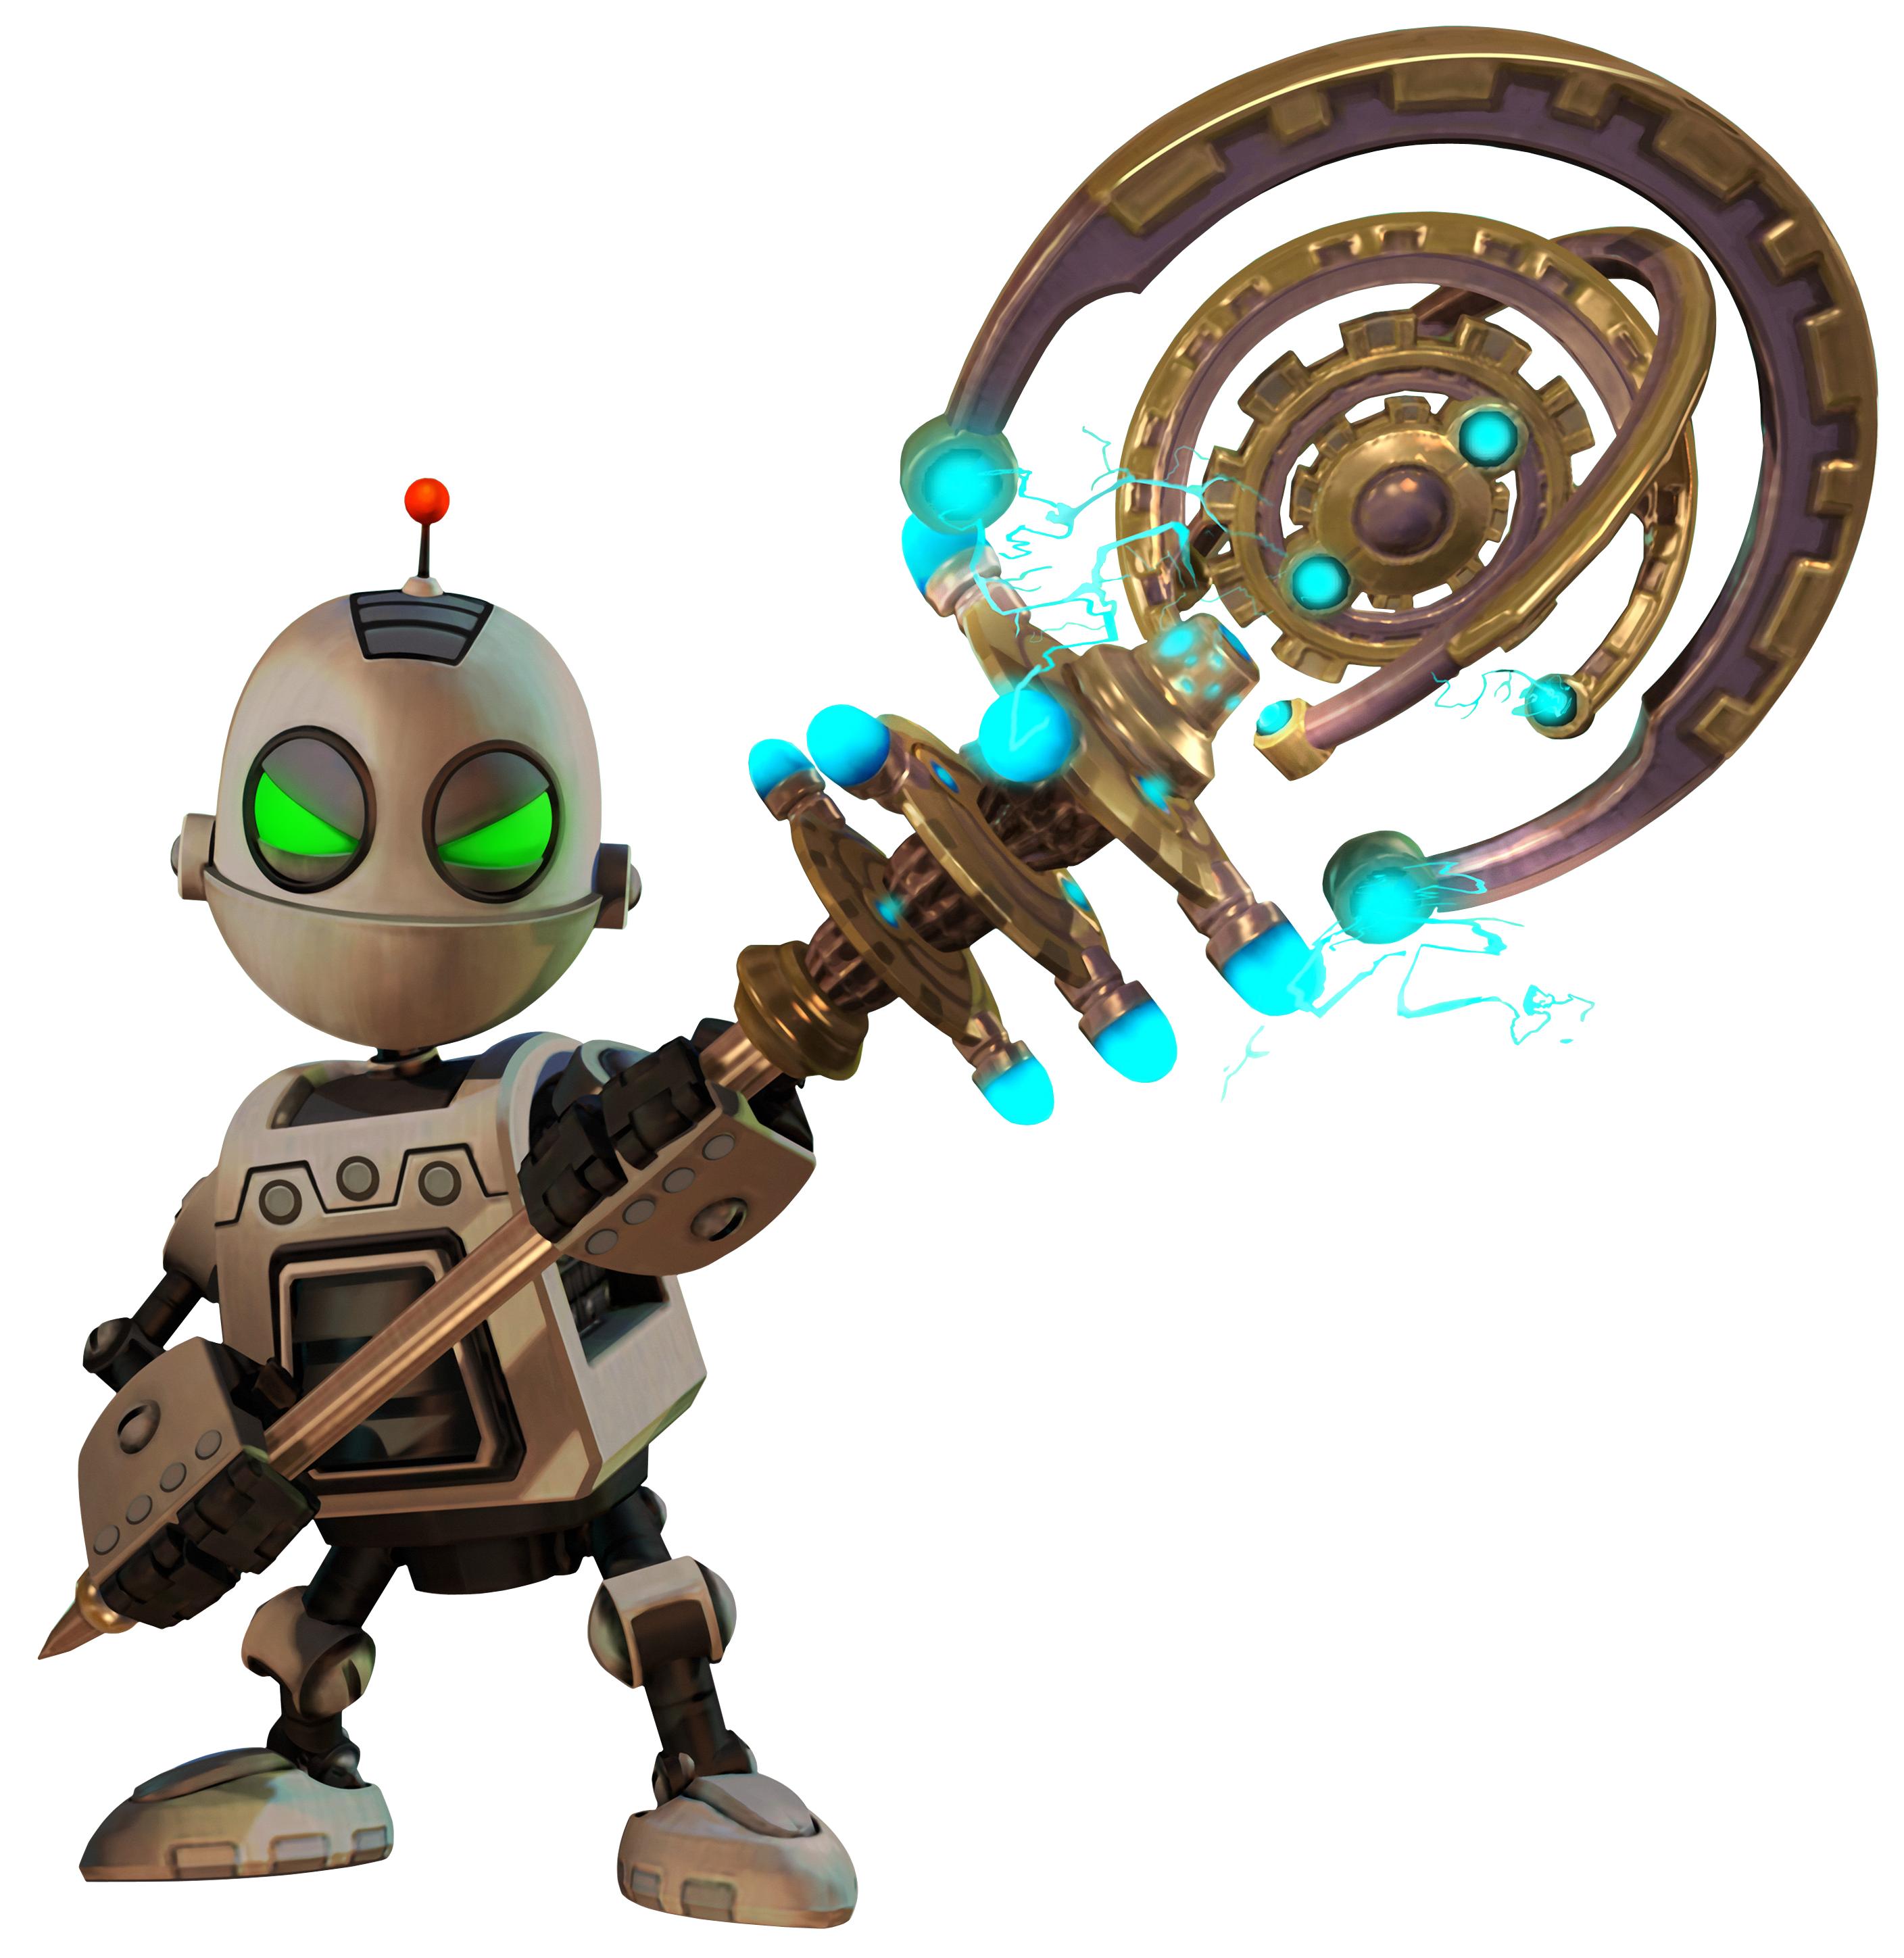 Clank (Ratchet & Clank)